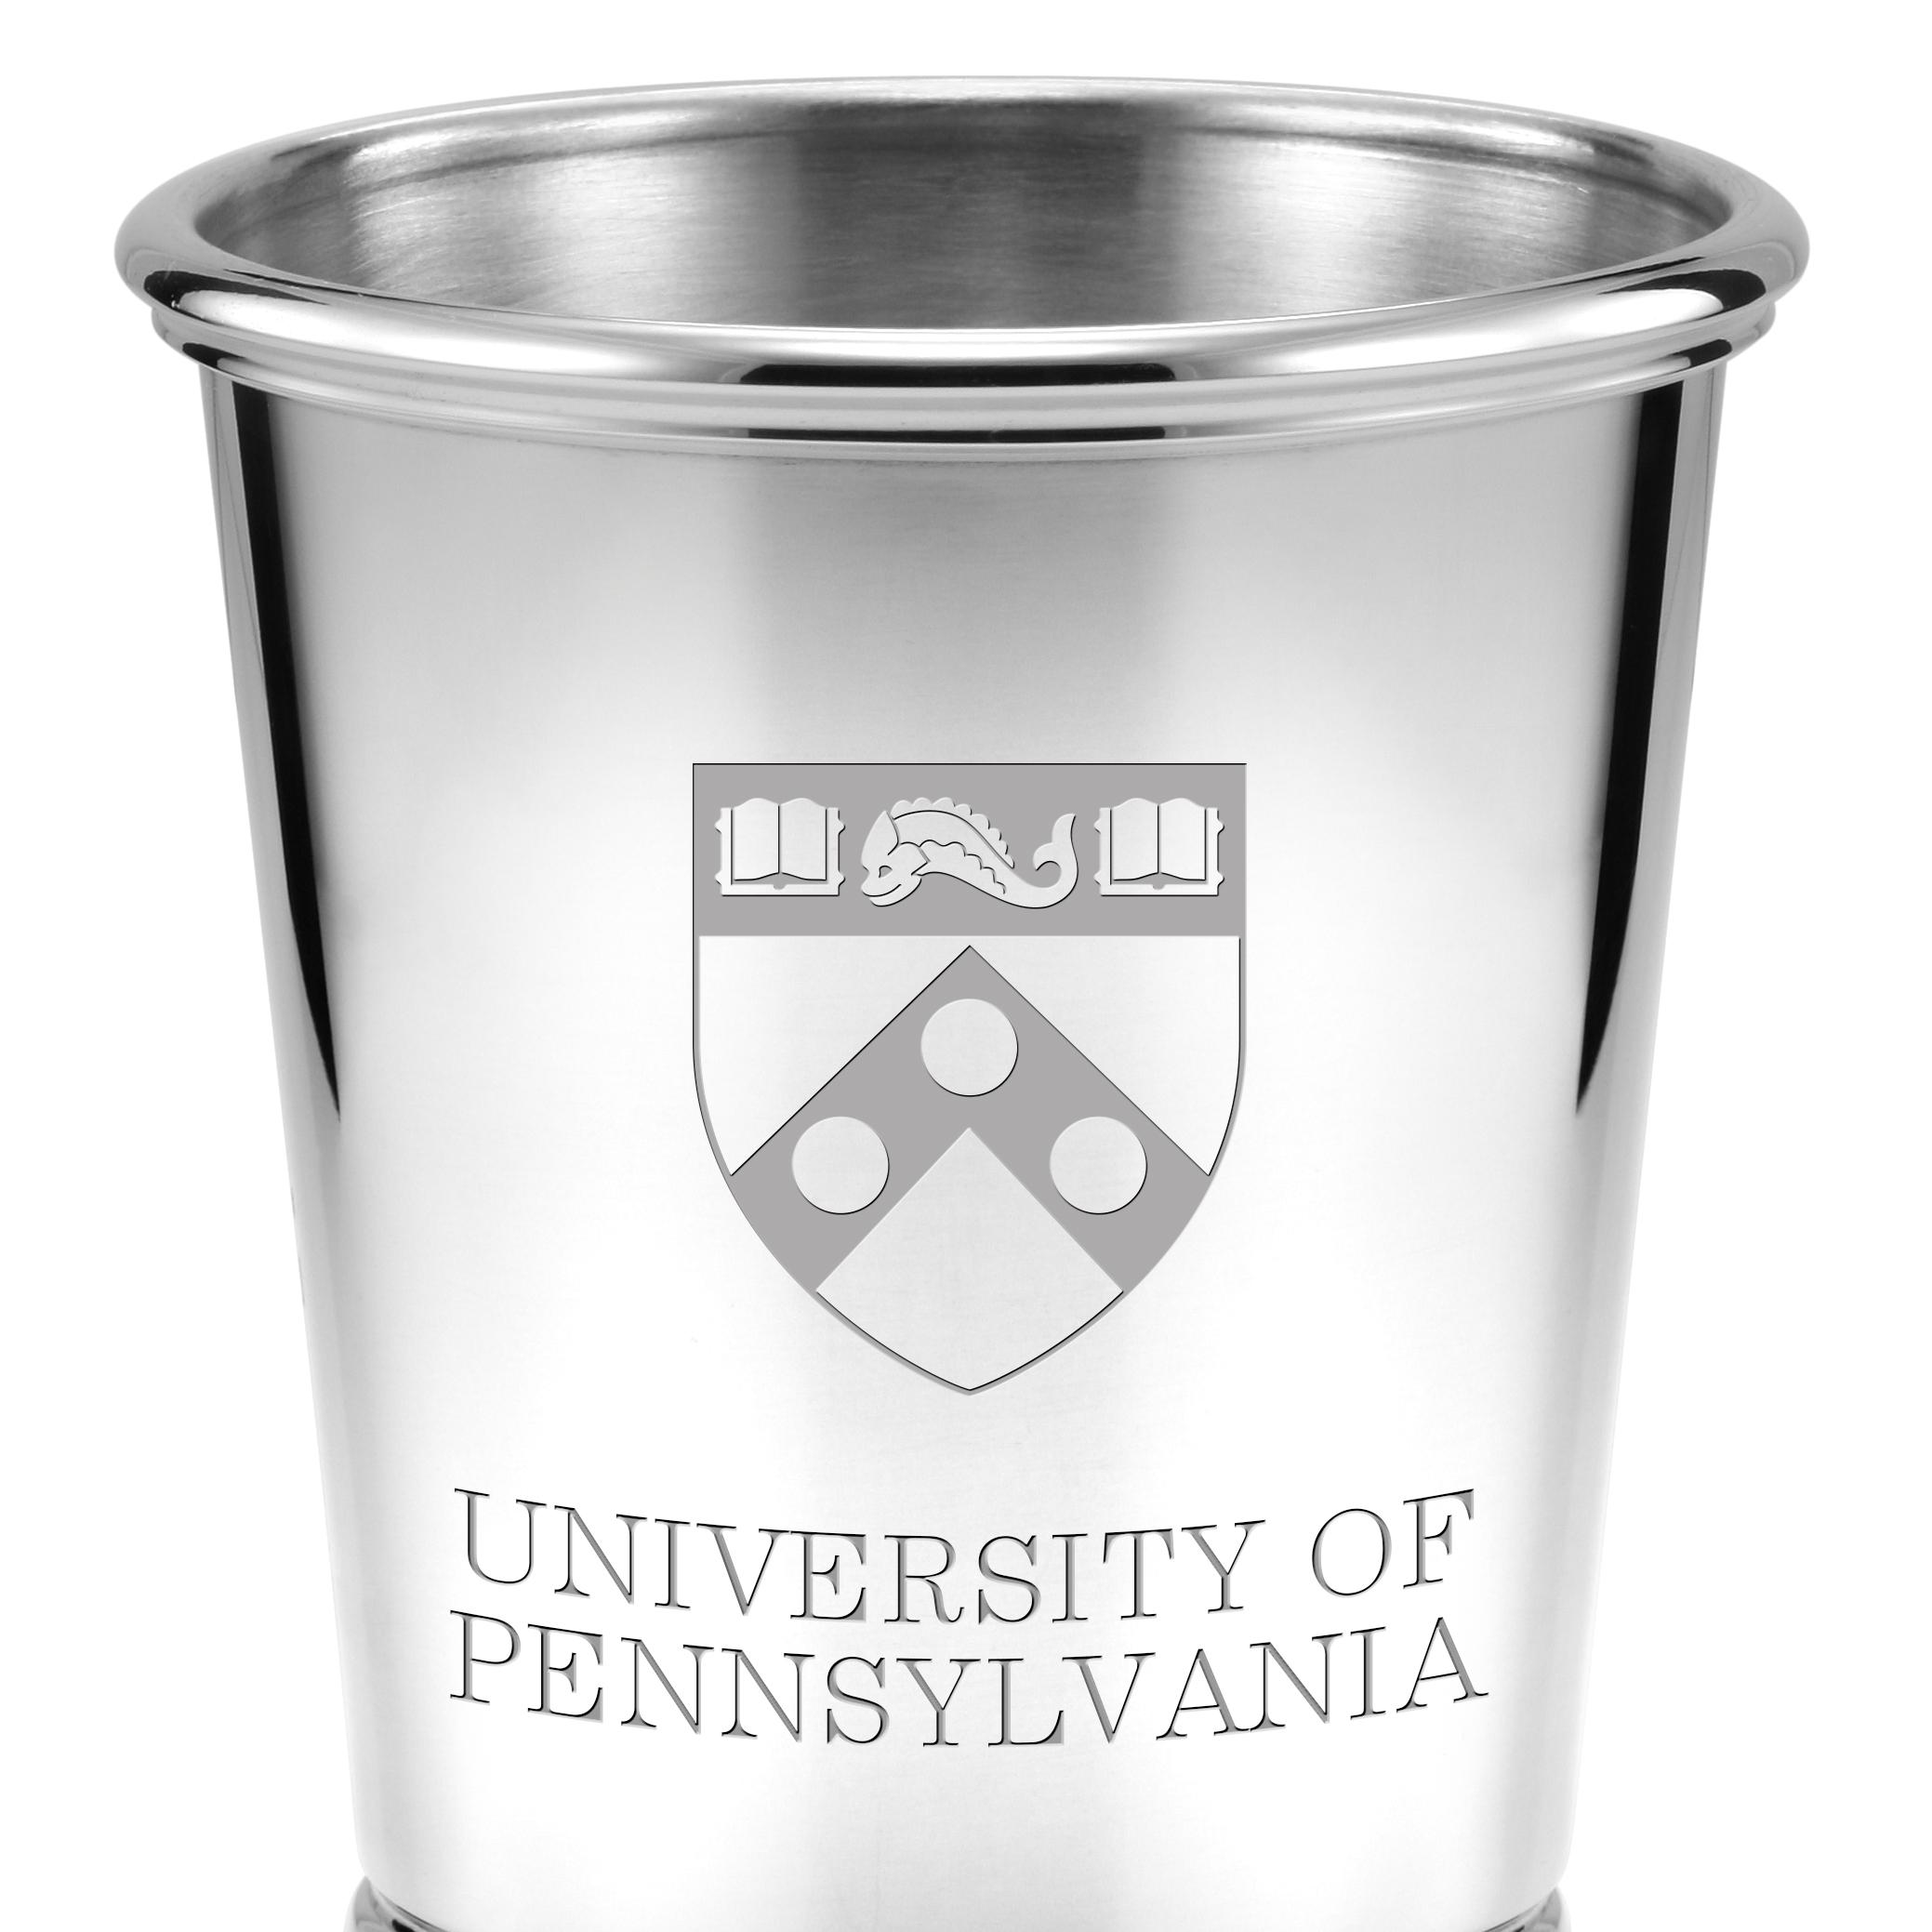 Penn Pewter Julep Cup - Image 2